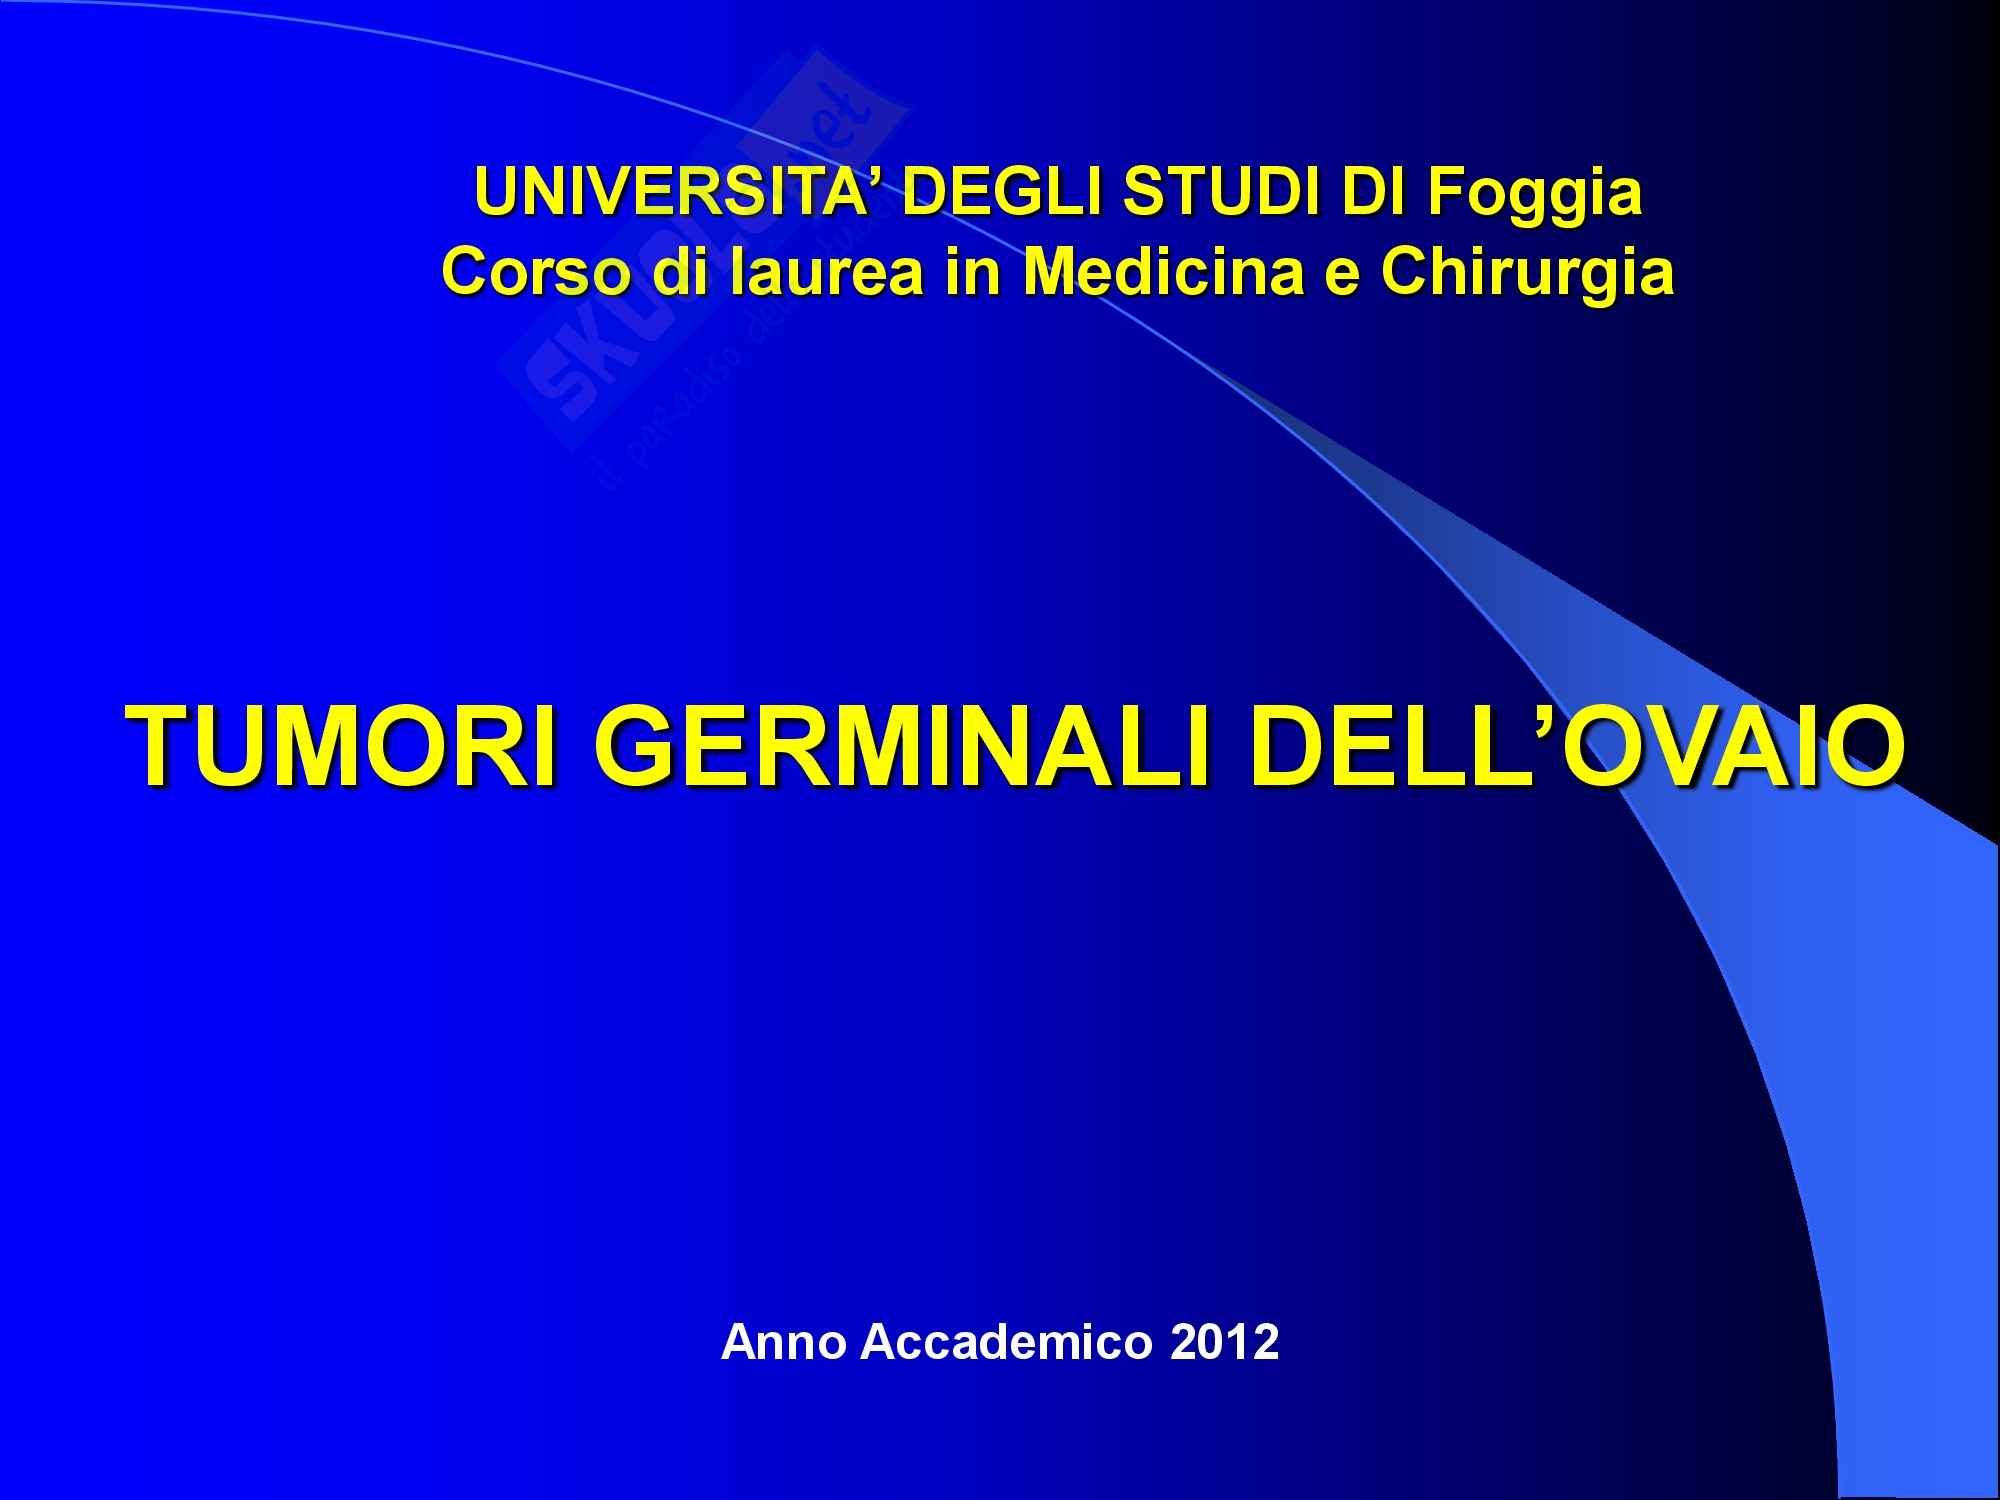 Ginecologia e Ostetricia - Neoplasie germinali ovariche